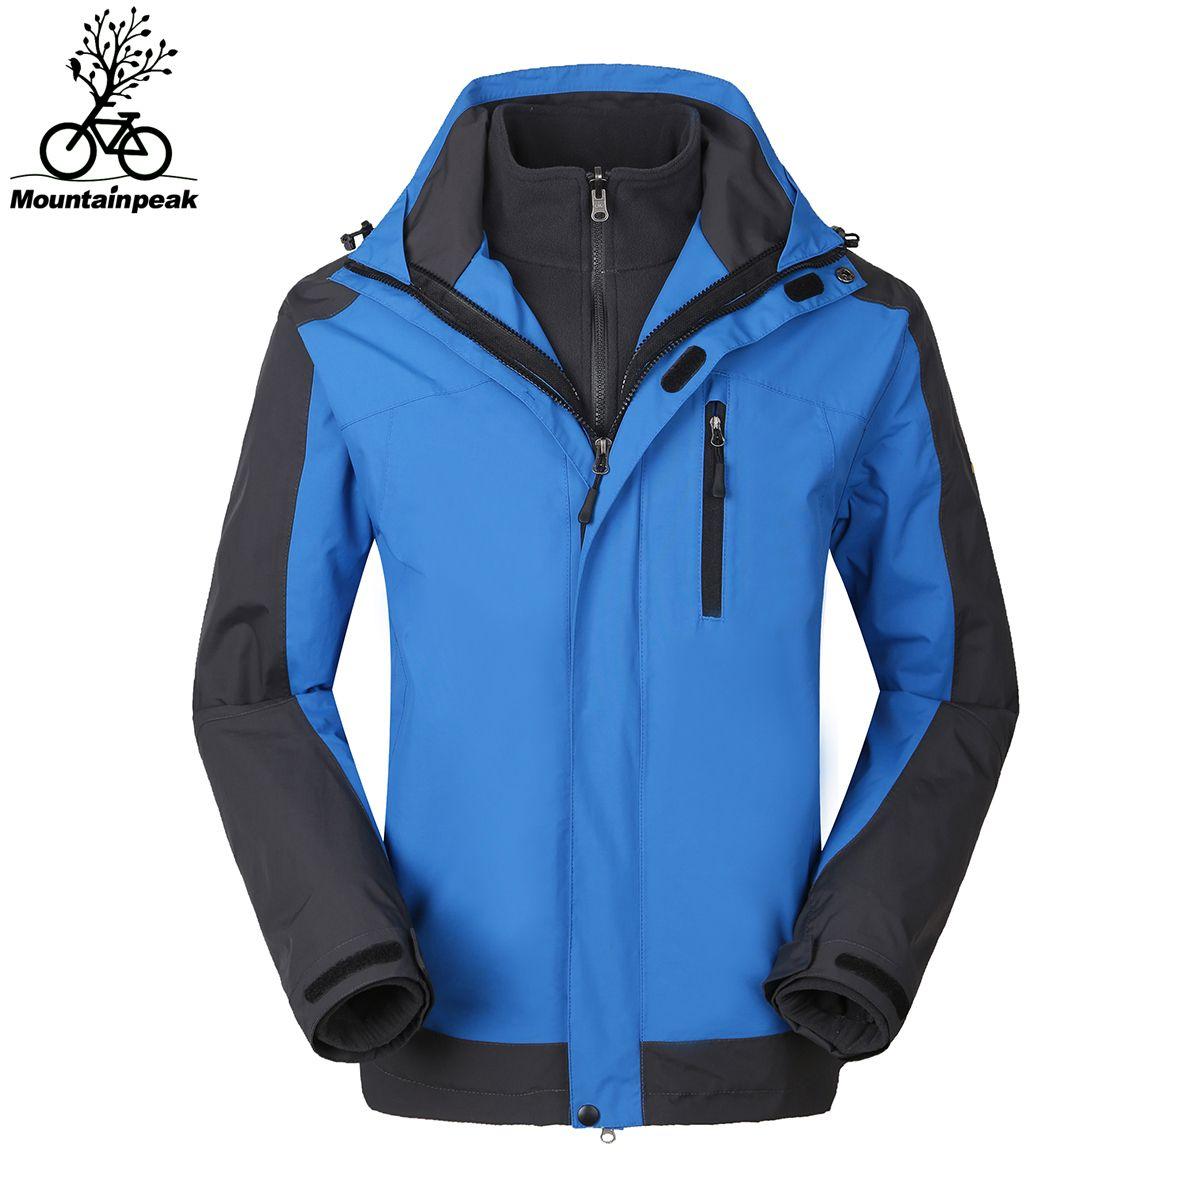 3b696fa90 2019 Mountainpeak Riding Coat Outdoor Hiking Jackets Waterproof Cycling  Jersey Warm Coat Jacket Climbing Jacket Men Pizex Sportswear From Pittsburgh